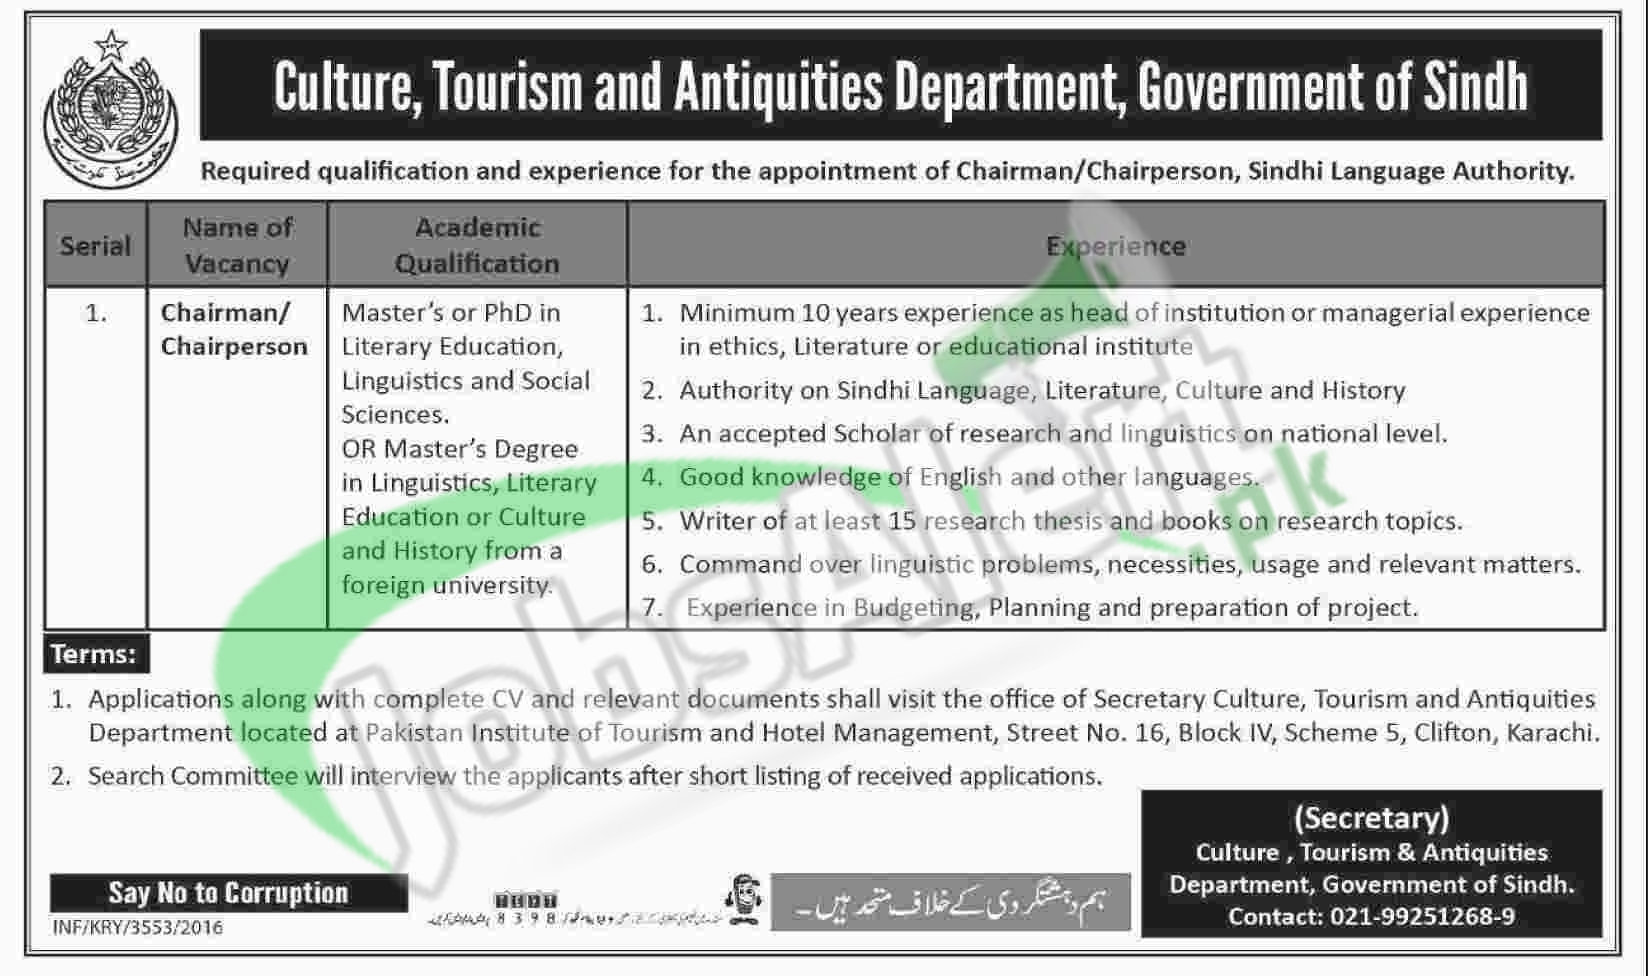 Culture, Tourism & Antiquities Department